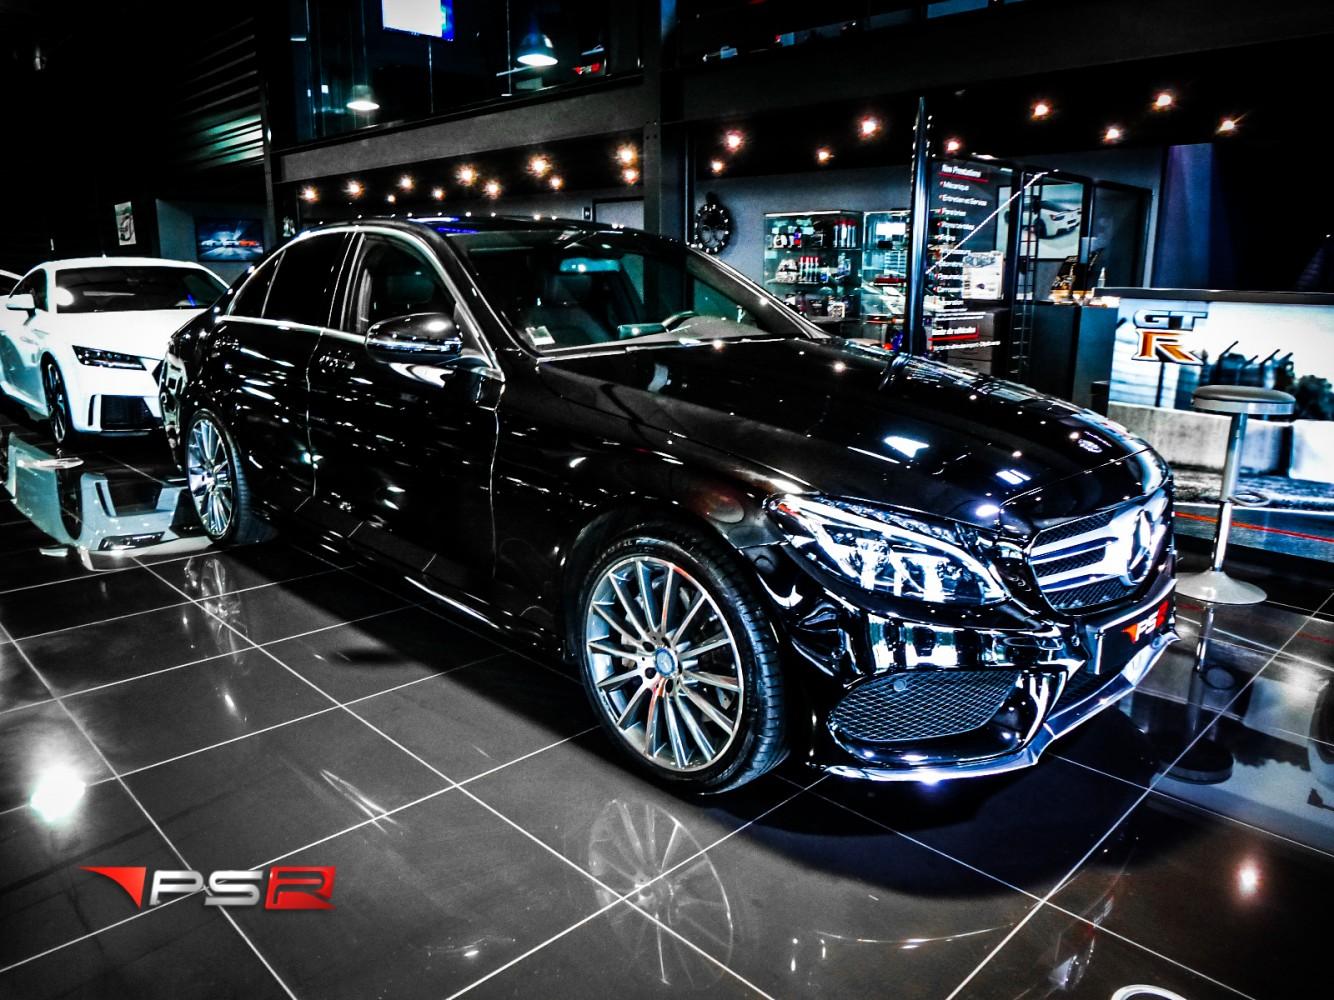 Mercedes Classe C 4 Iv 300 H Hybrid Fascination 7g Tronic